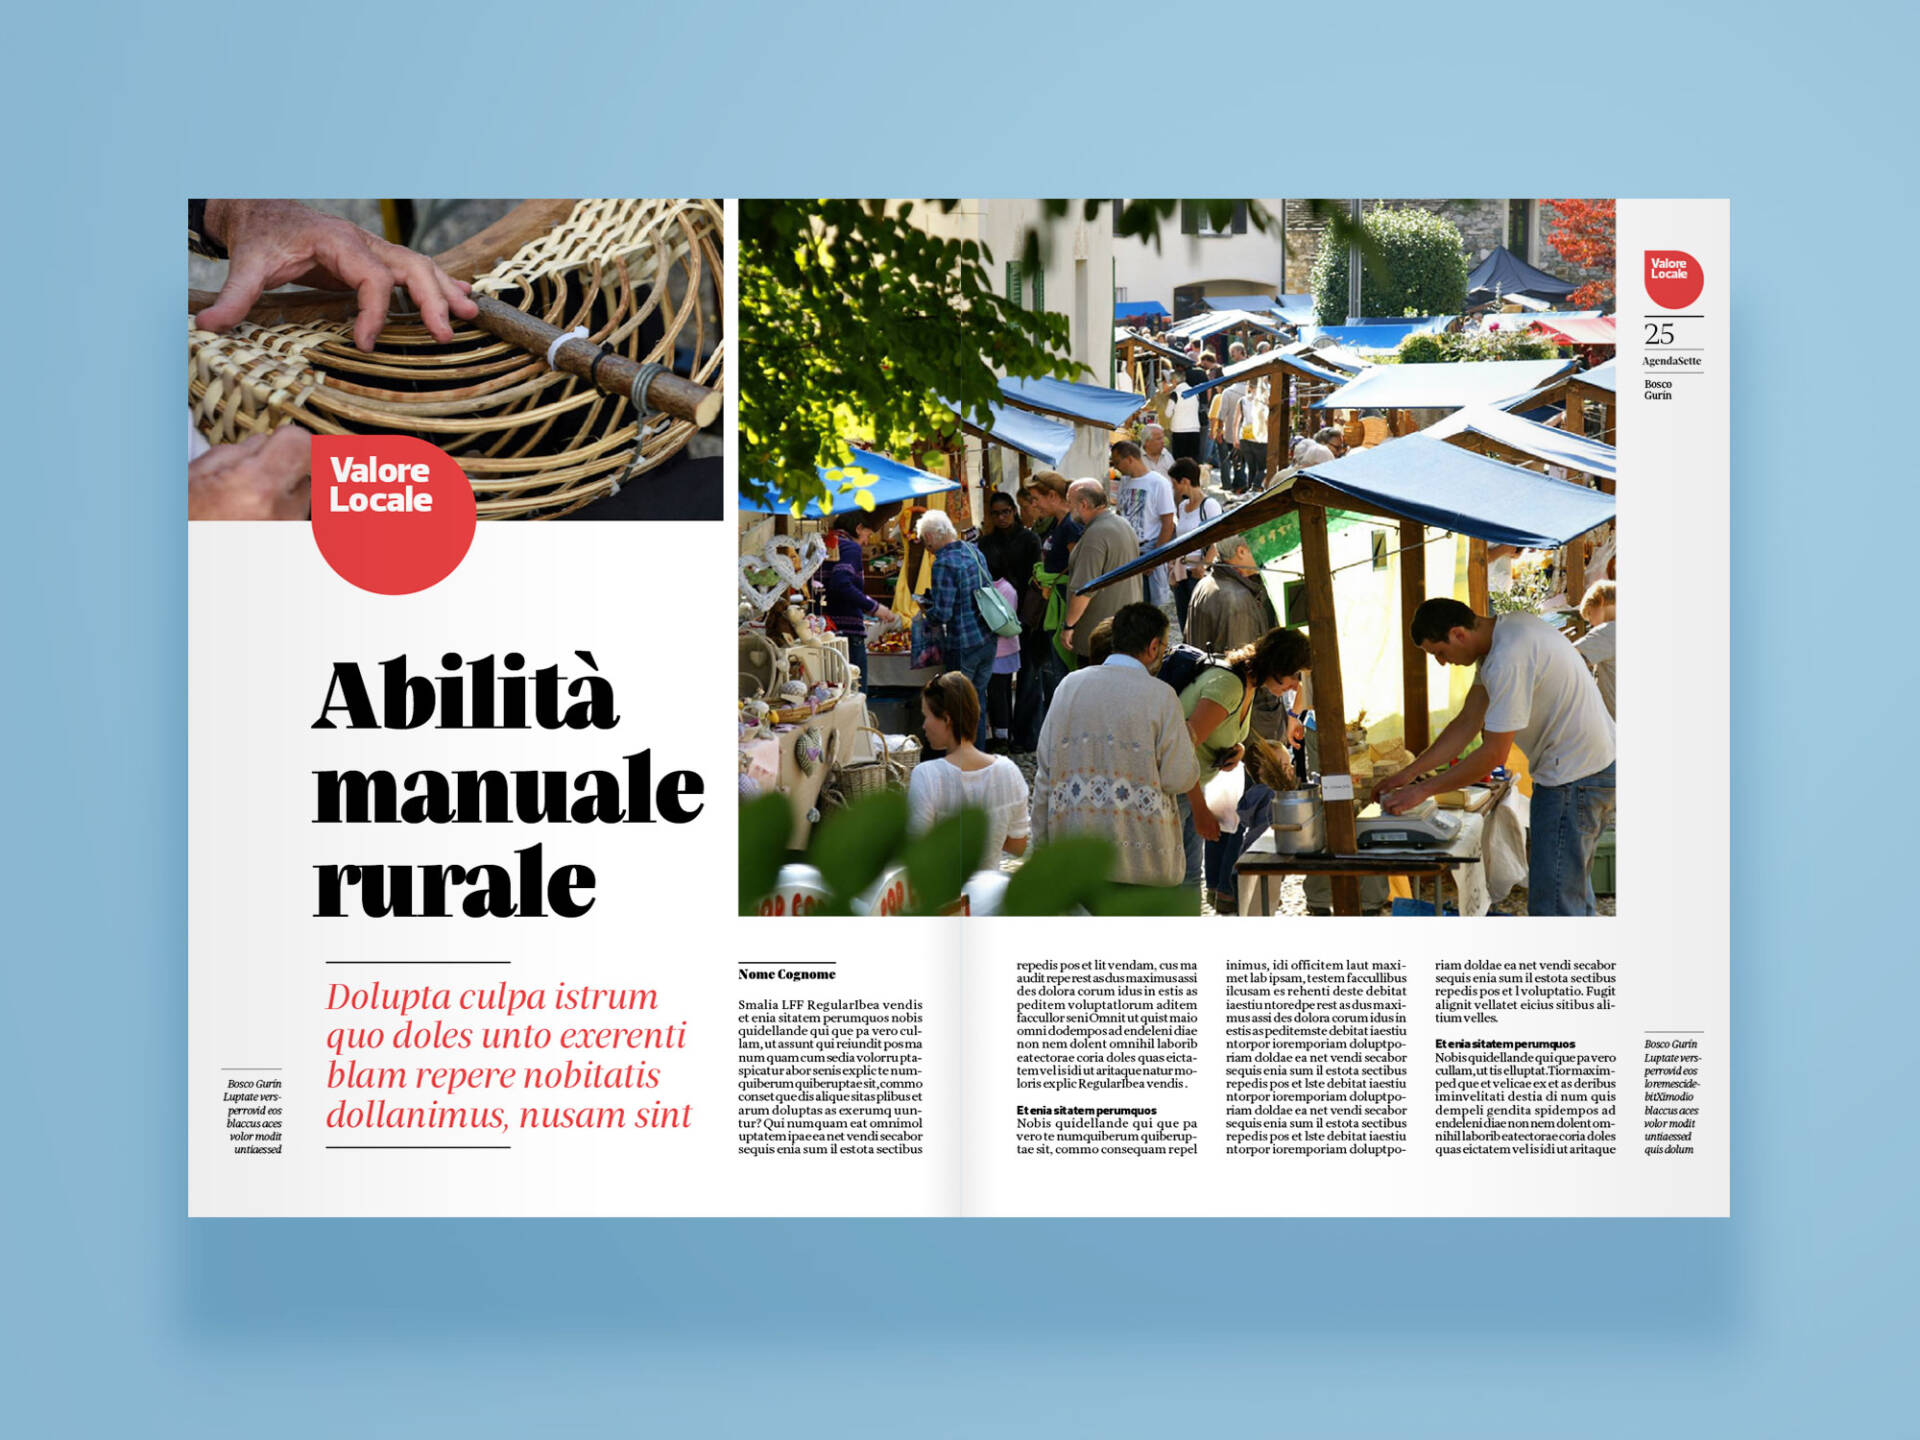 AgendaSette_04_Wenceslau_News_Design